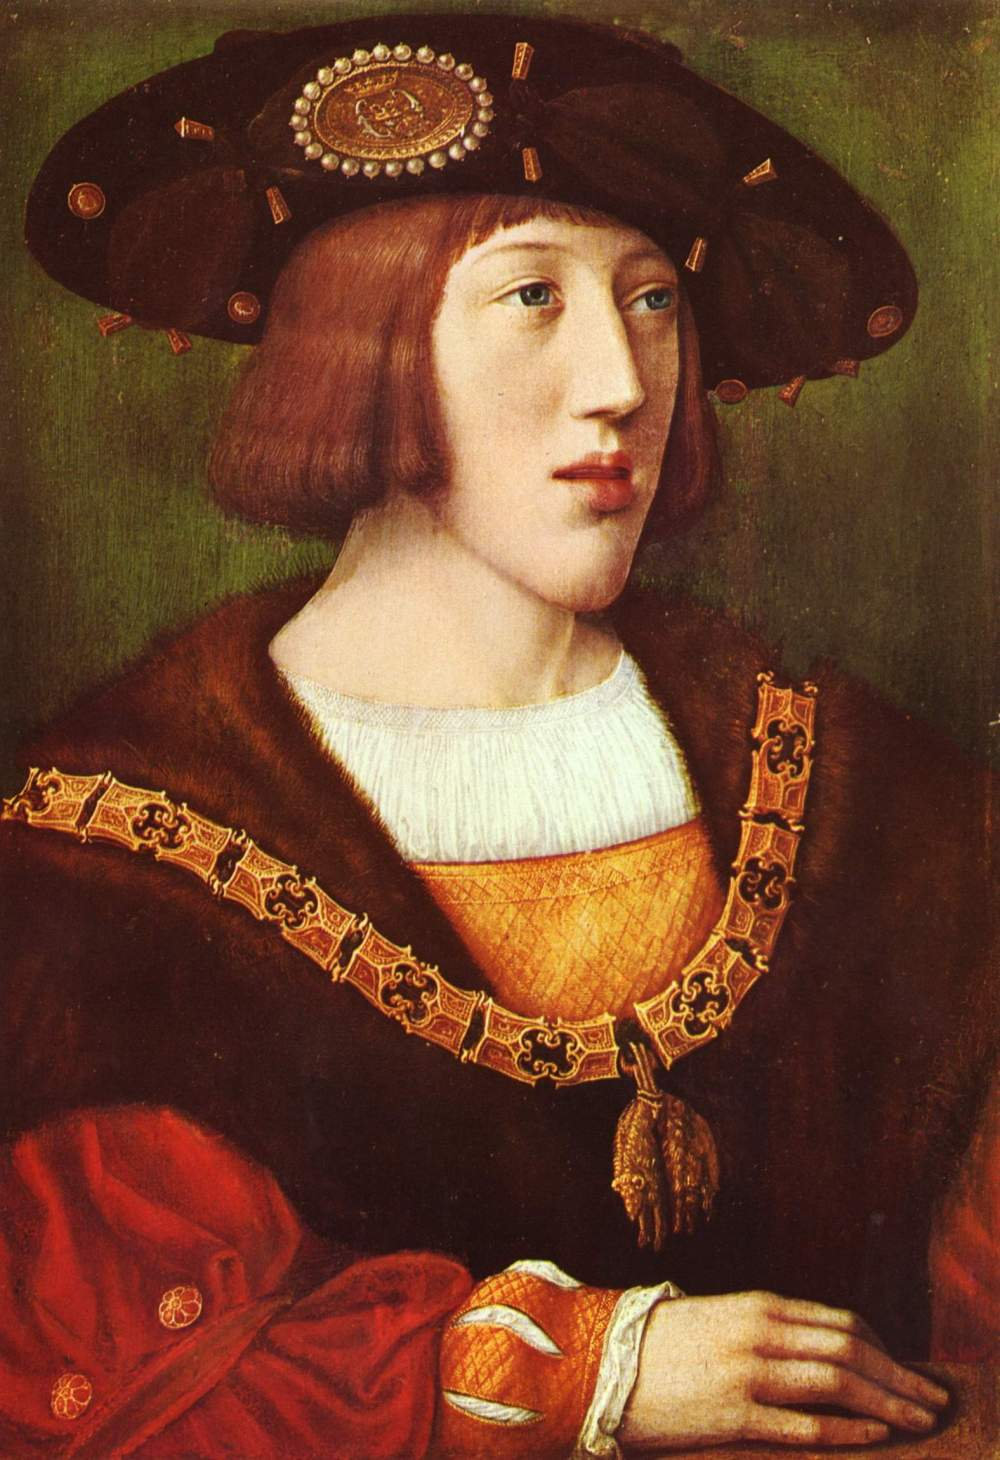 Bernaerd Van Orley. Retrato de Carlos I joven. Hacia 1515. Museo del Louvre. Paris